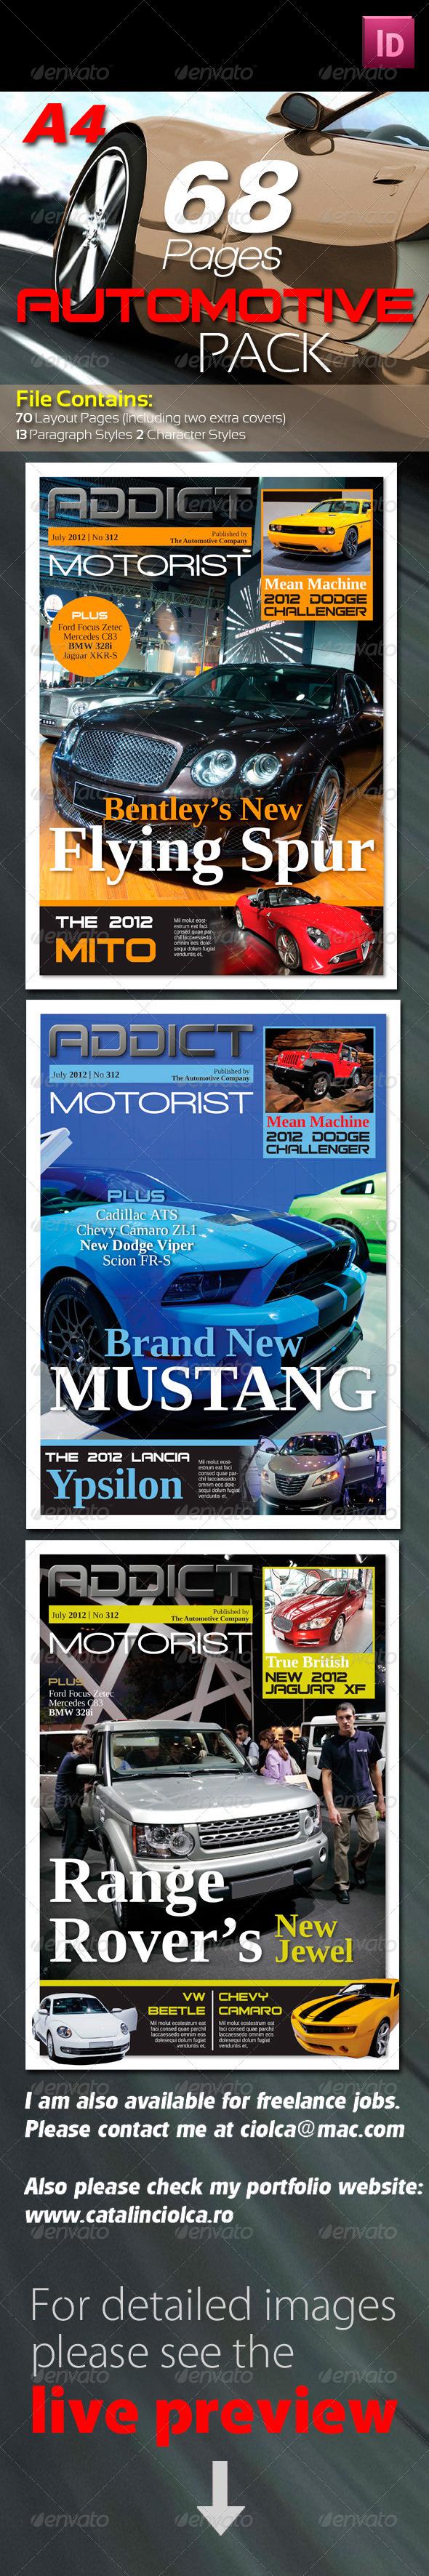 GraphicRiver 68 Pages Automotive Magazine Pack 1765390